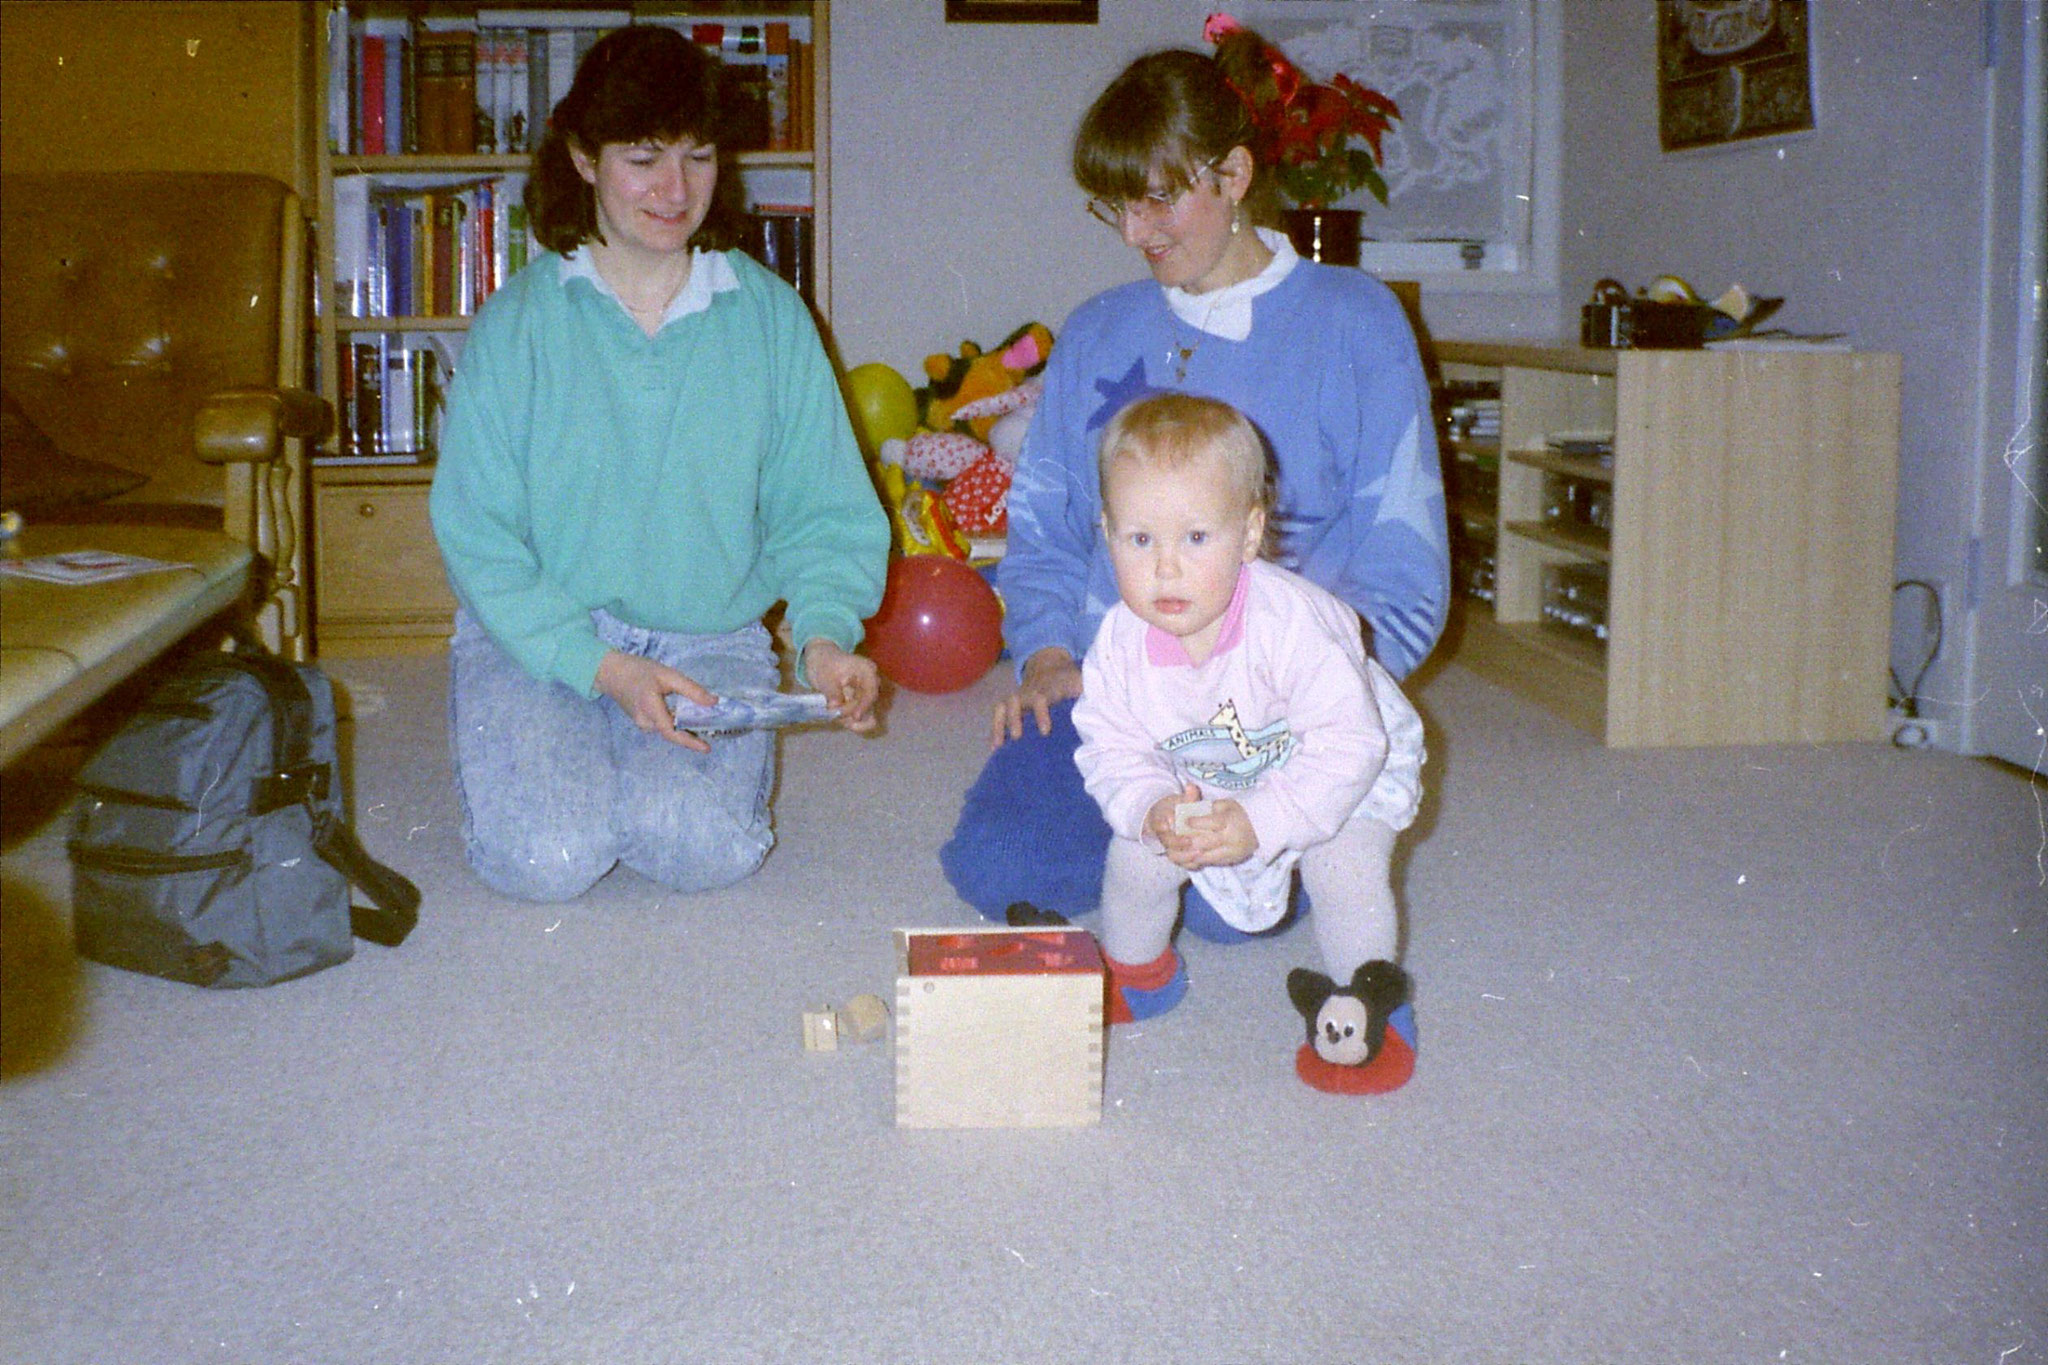 5/1/1989: 4: